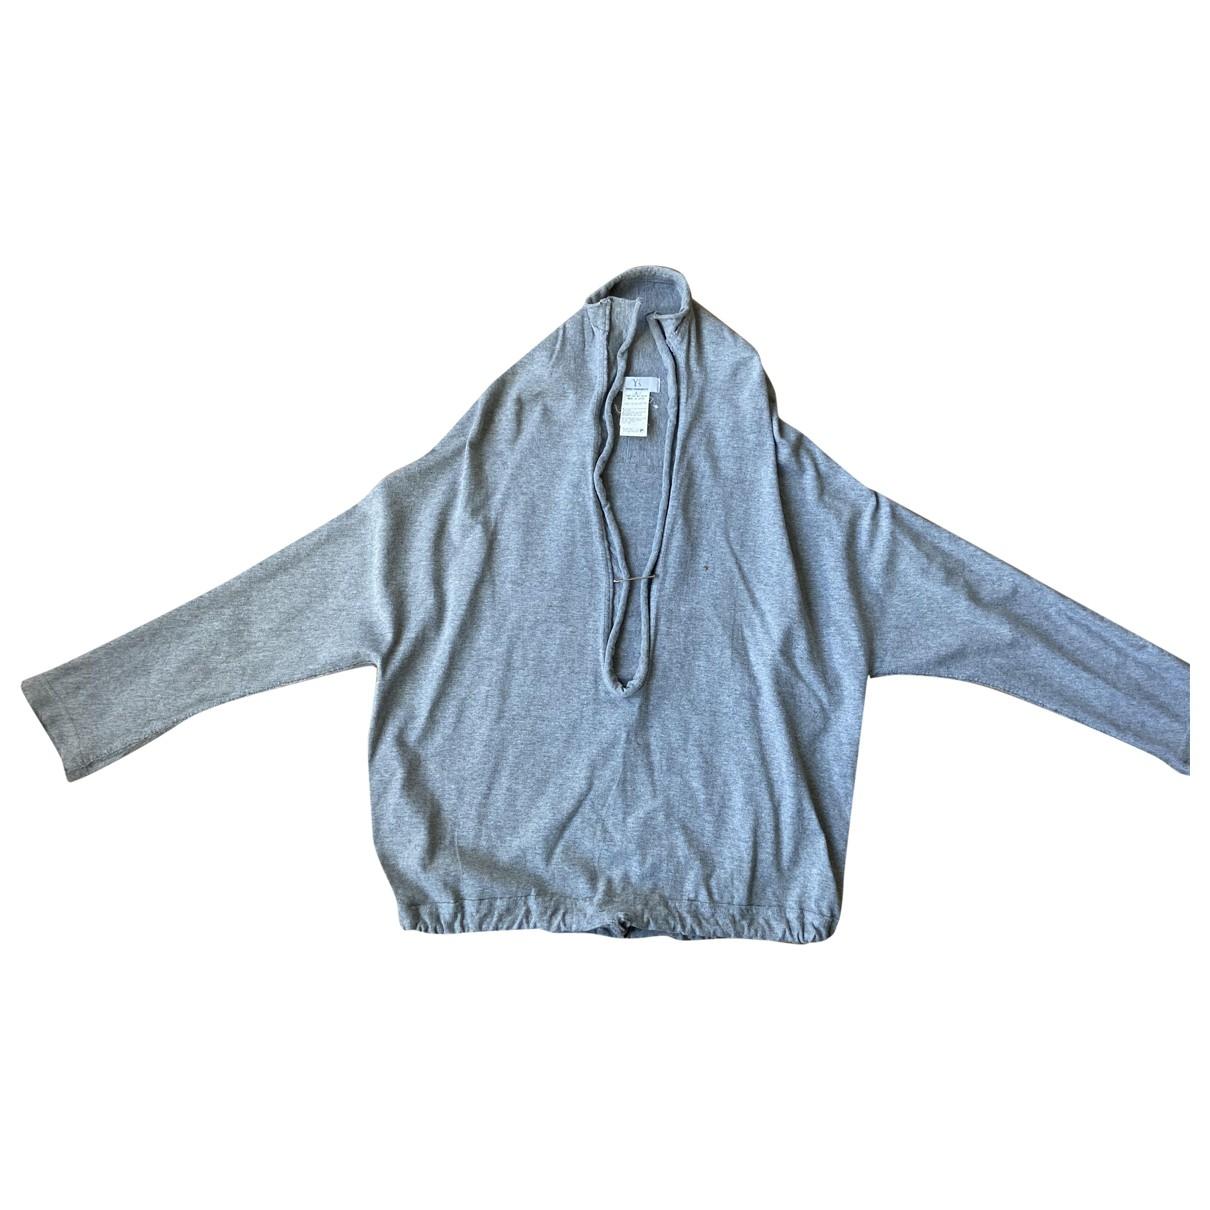 Yohji Yamamoto - Pull   pour femme en coton - gris